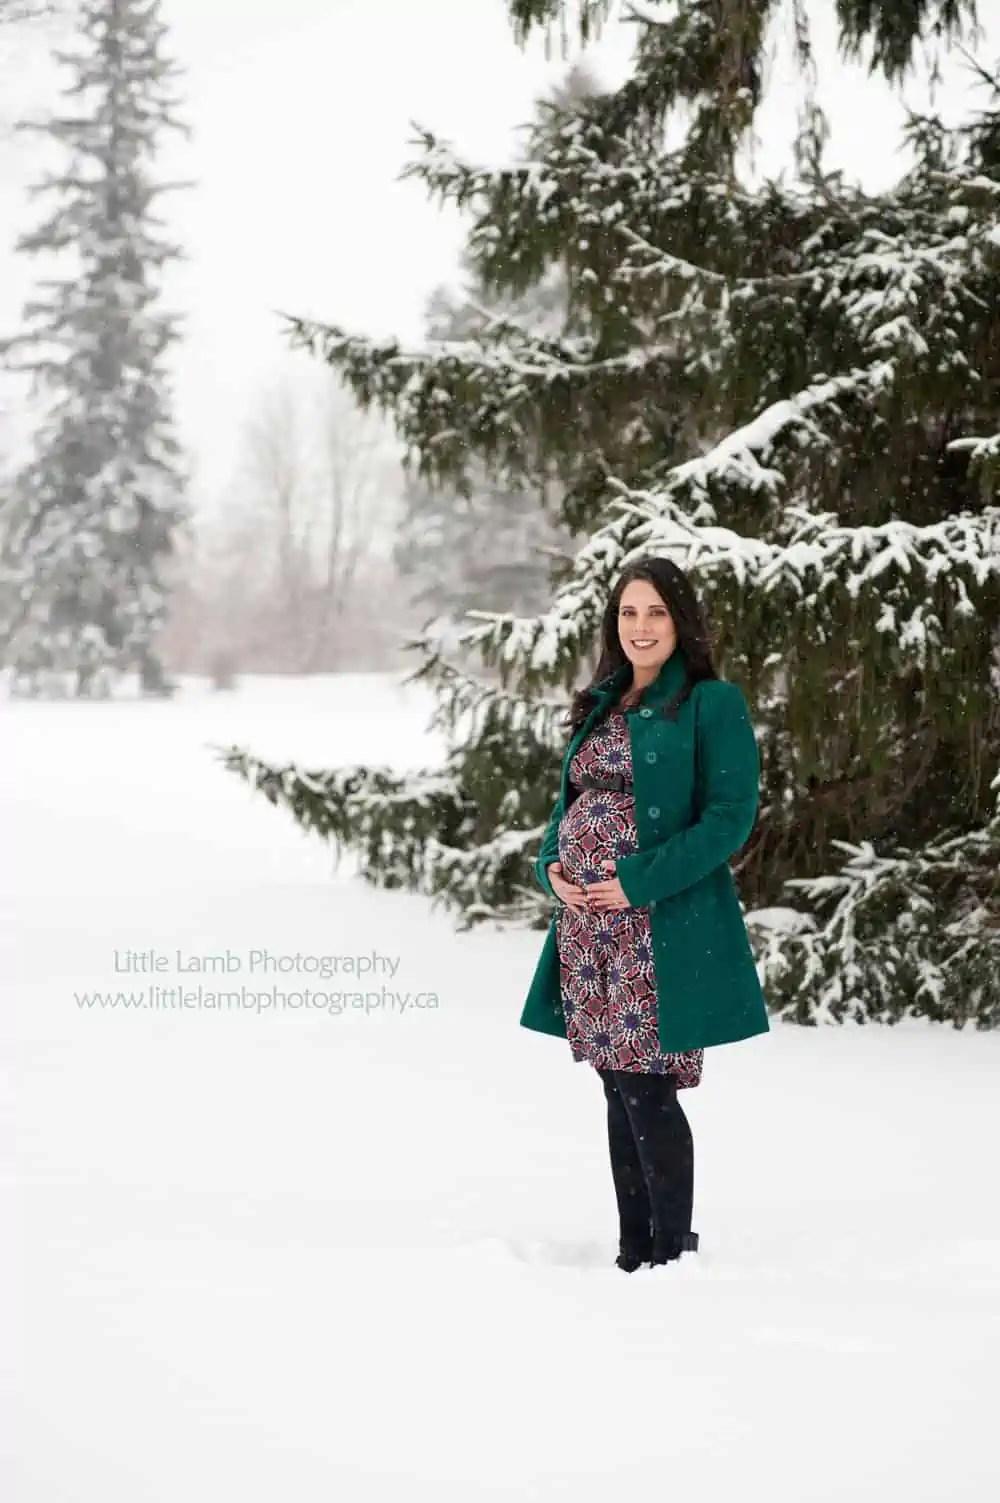 little-lamb-photography-ottawa-canada-1